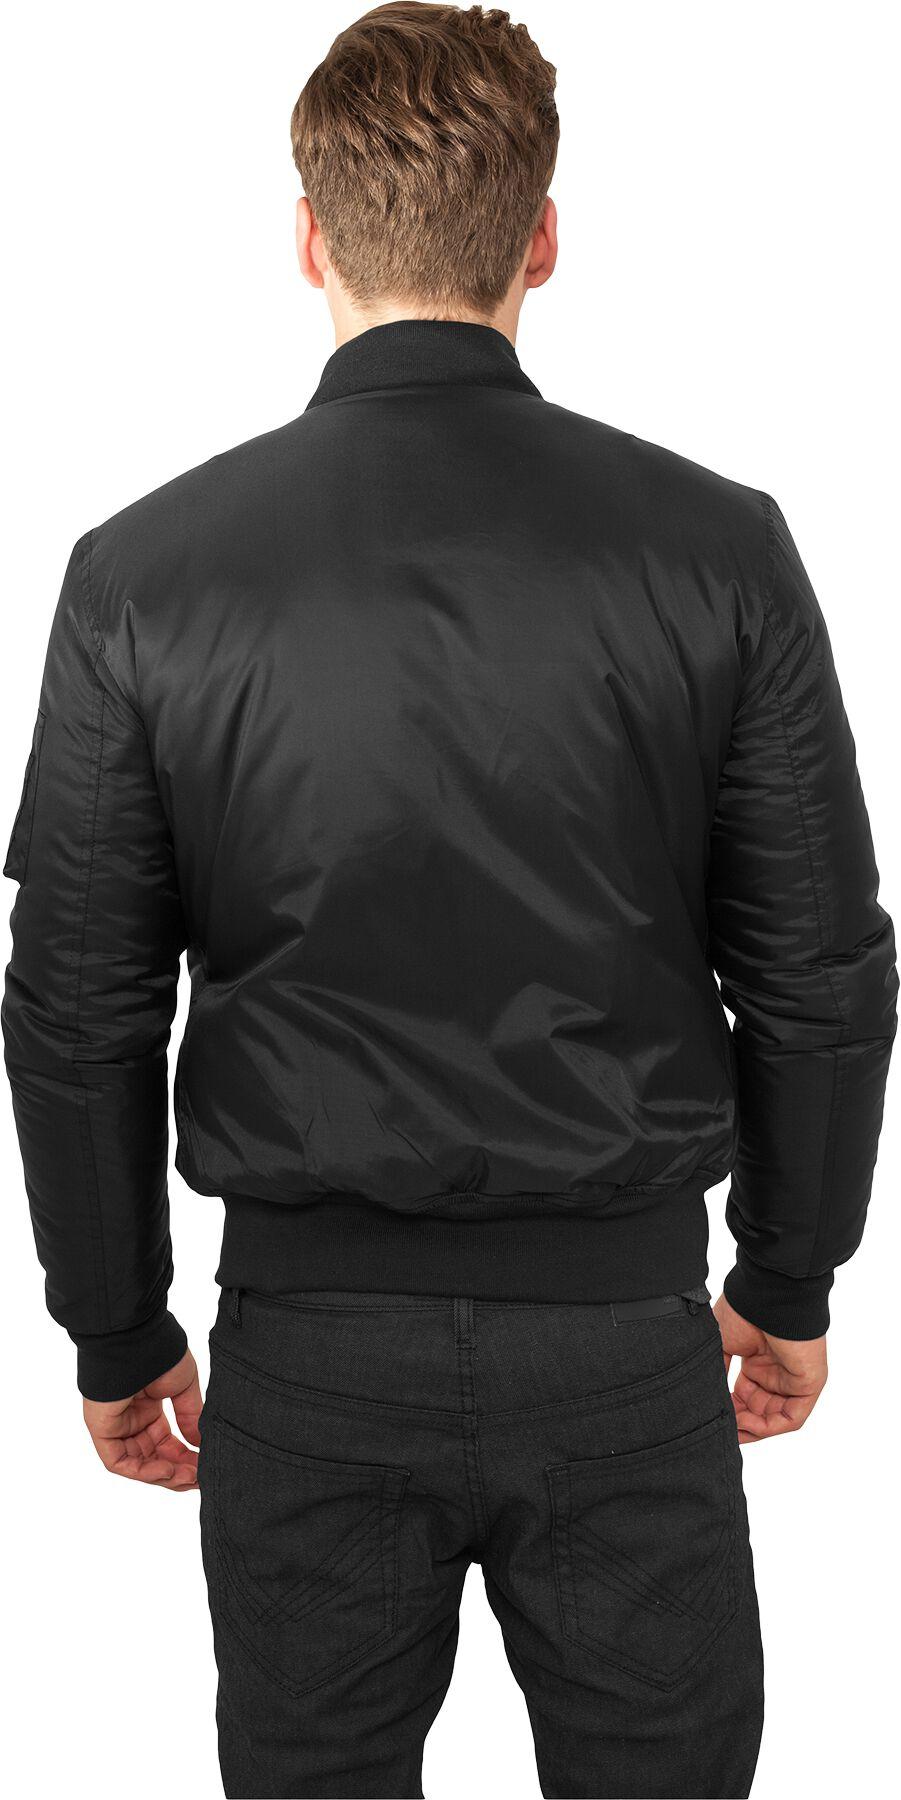 buy online 5182f e64bd Basic Bomber Jacket